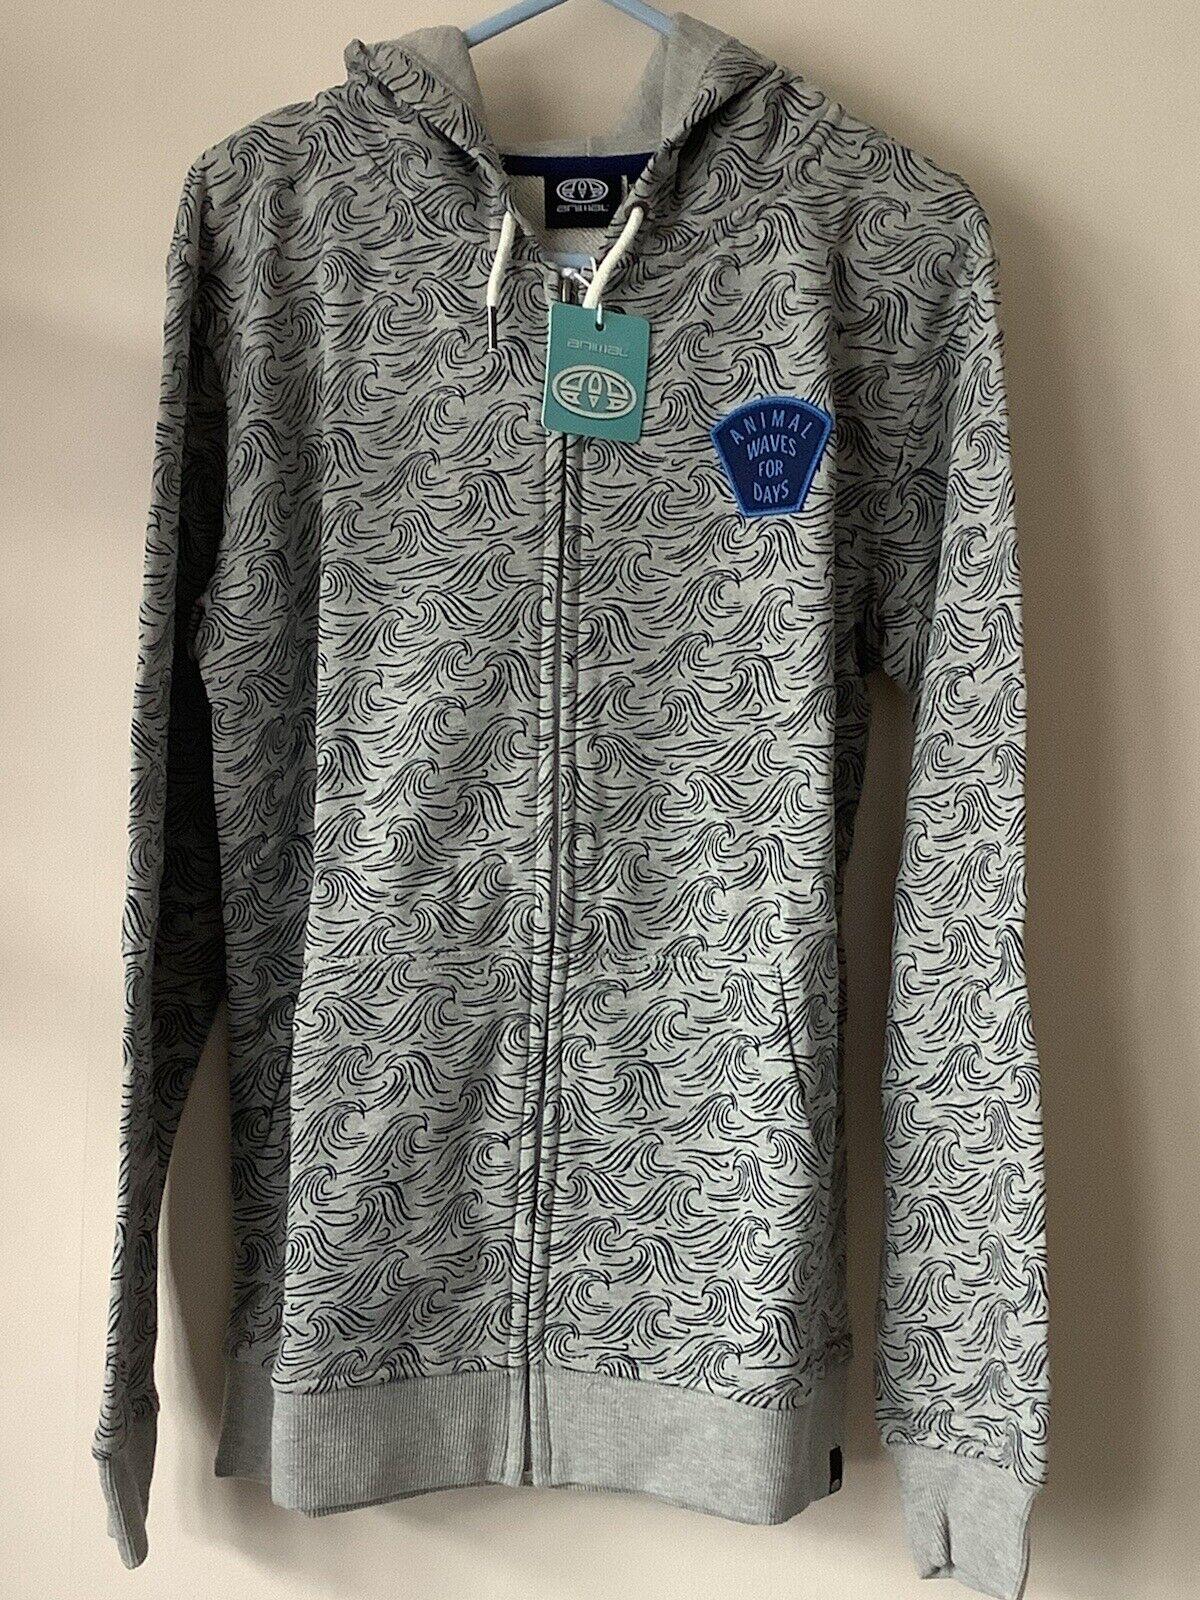 Animal New Grey Marl Seachild Zip Through Sweatshirt Jumper Top Hoodie Age 13/14